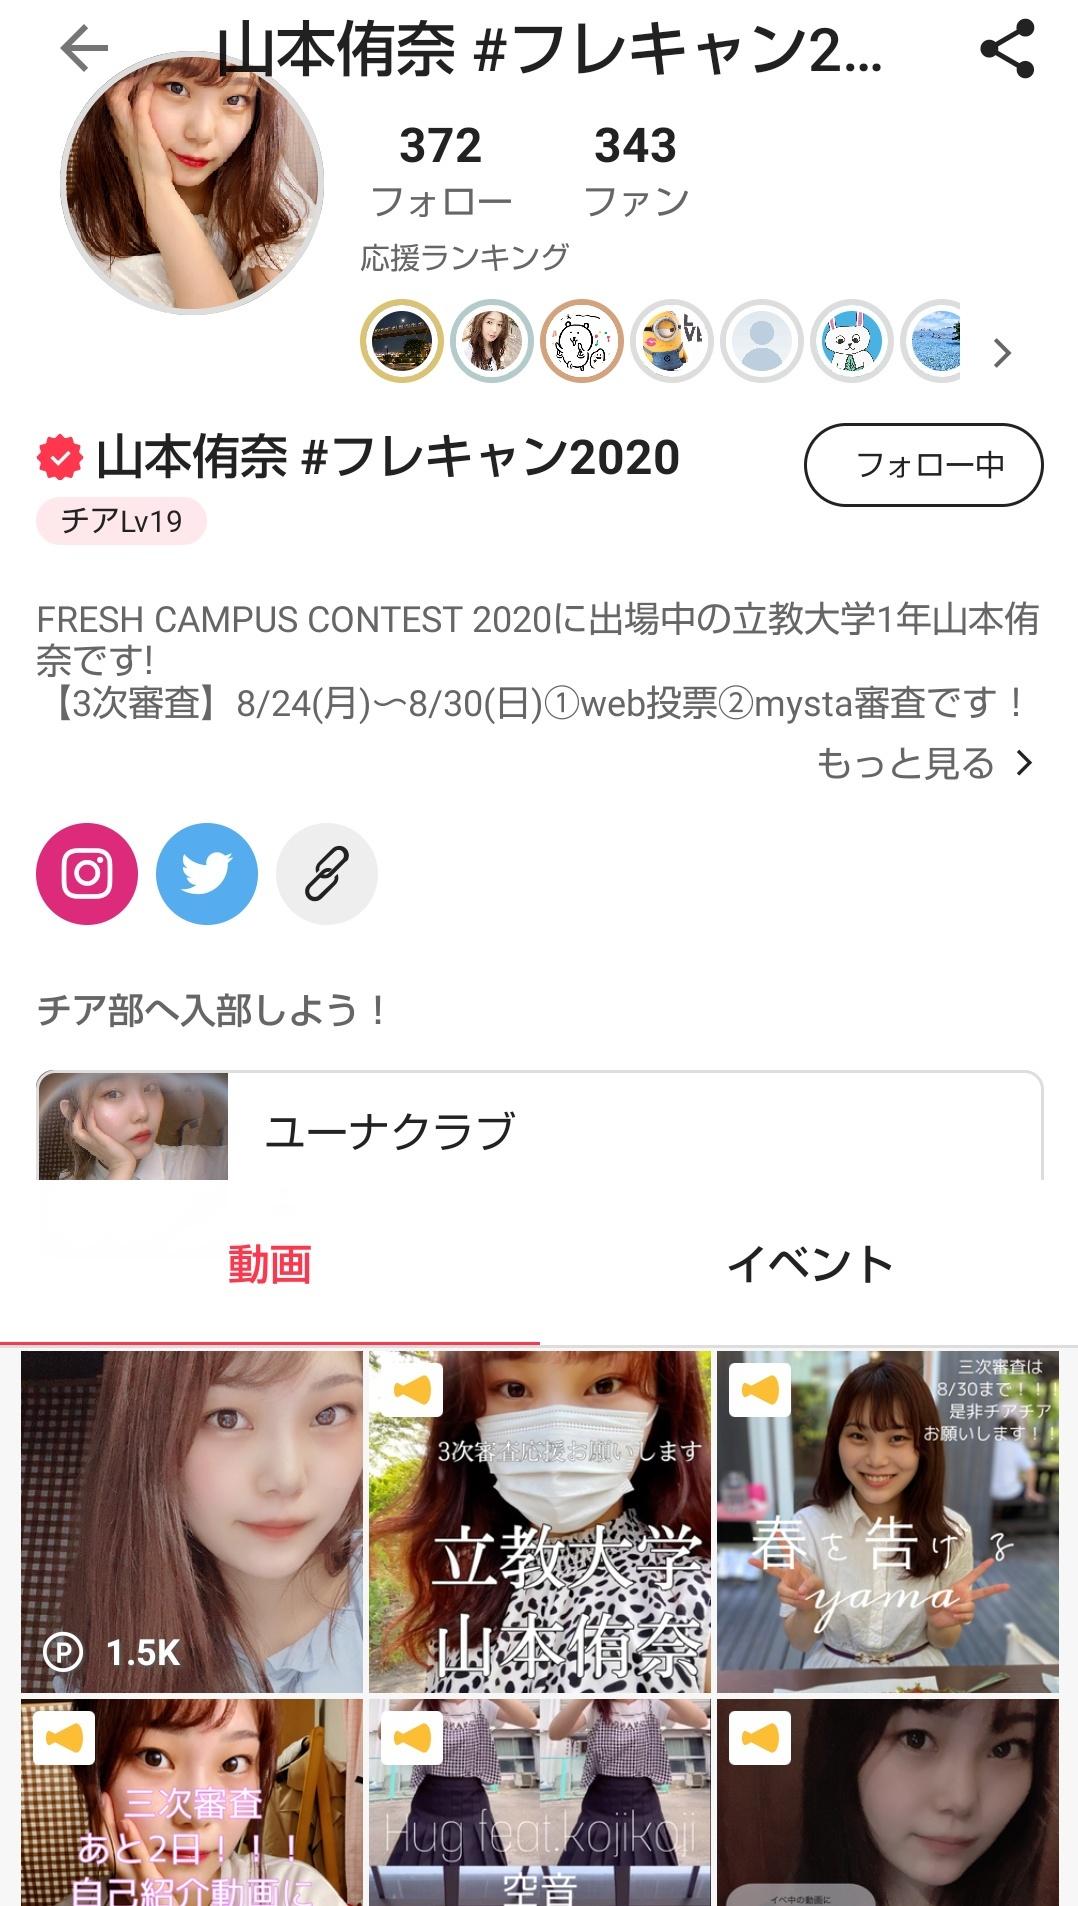 『D-cafe』と ゆうなちゃん♪_f0364455_22341773.jpg